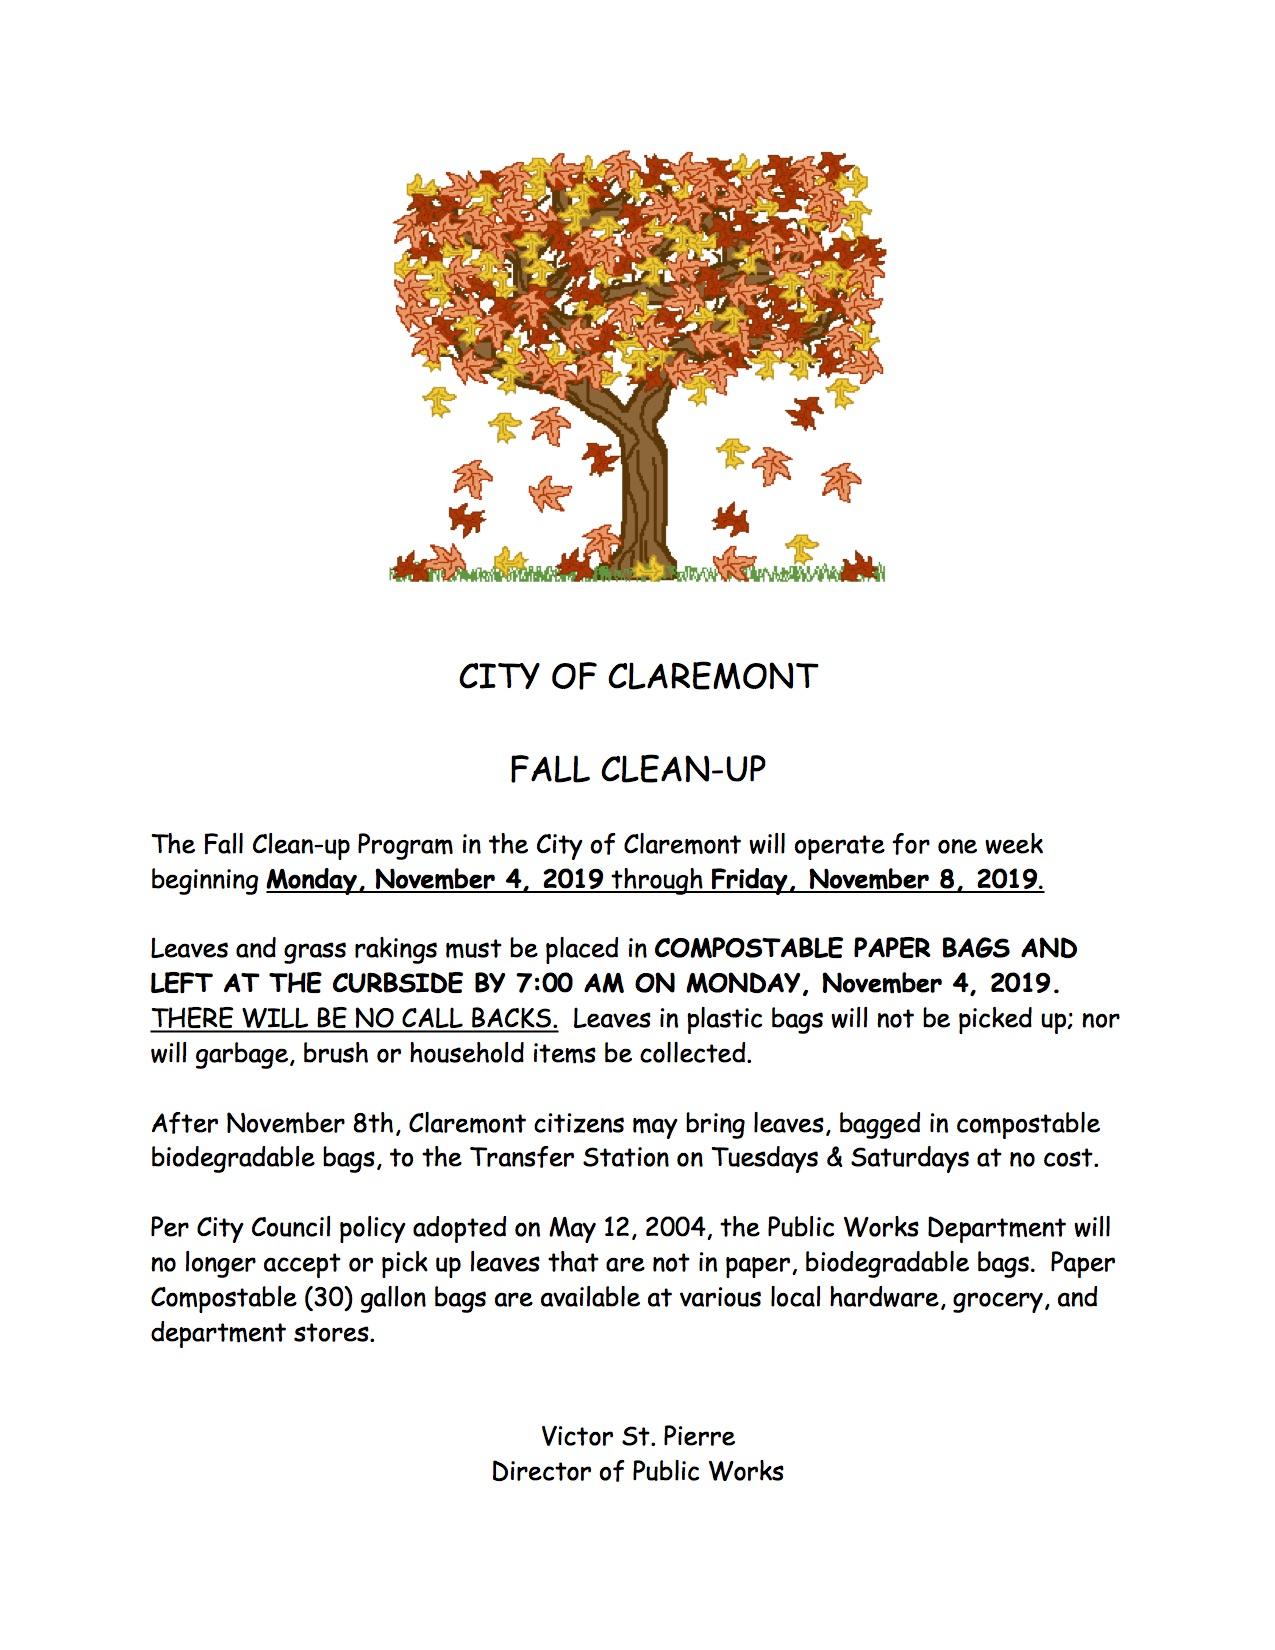 Leaf Pickup in Claremont